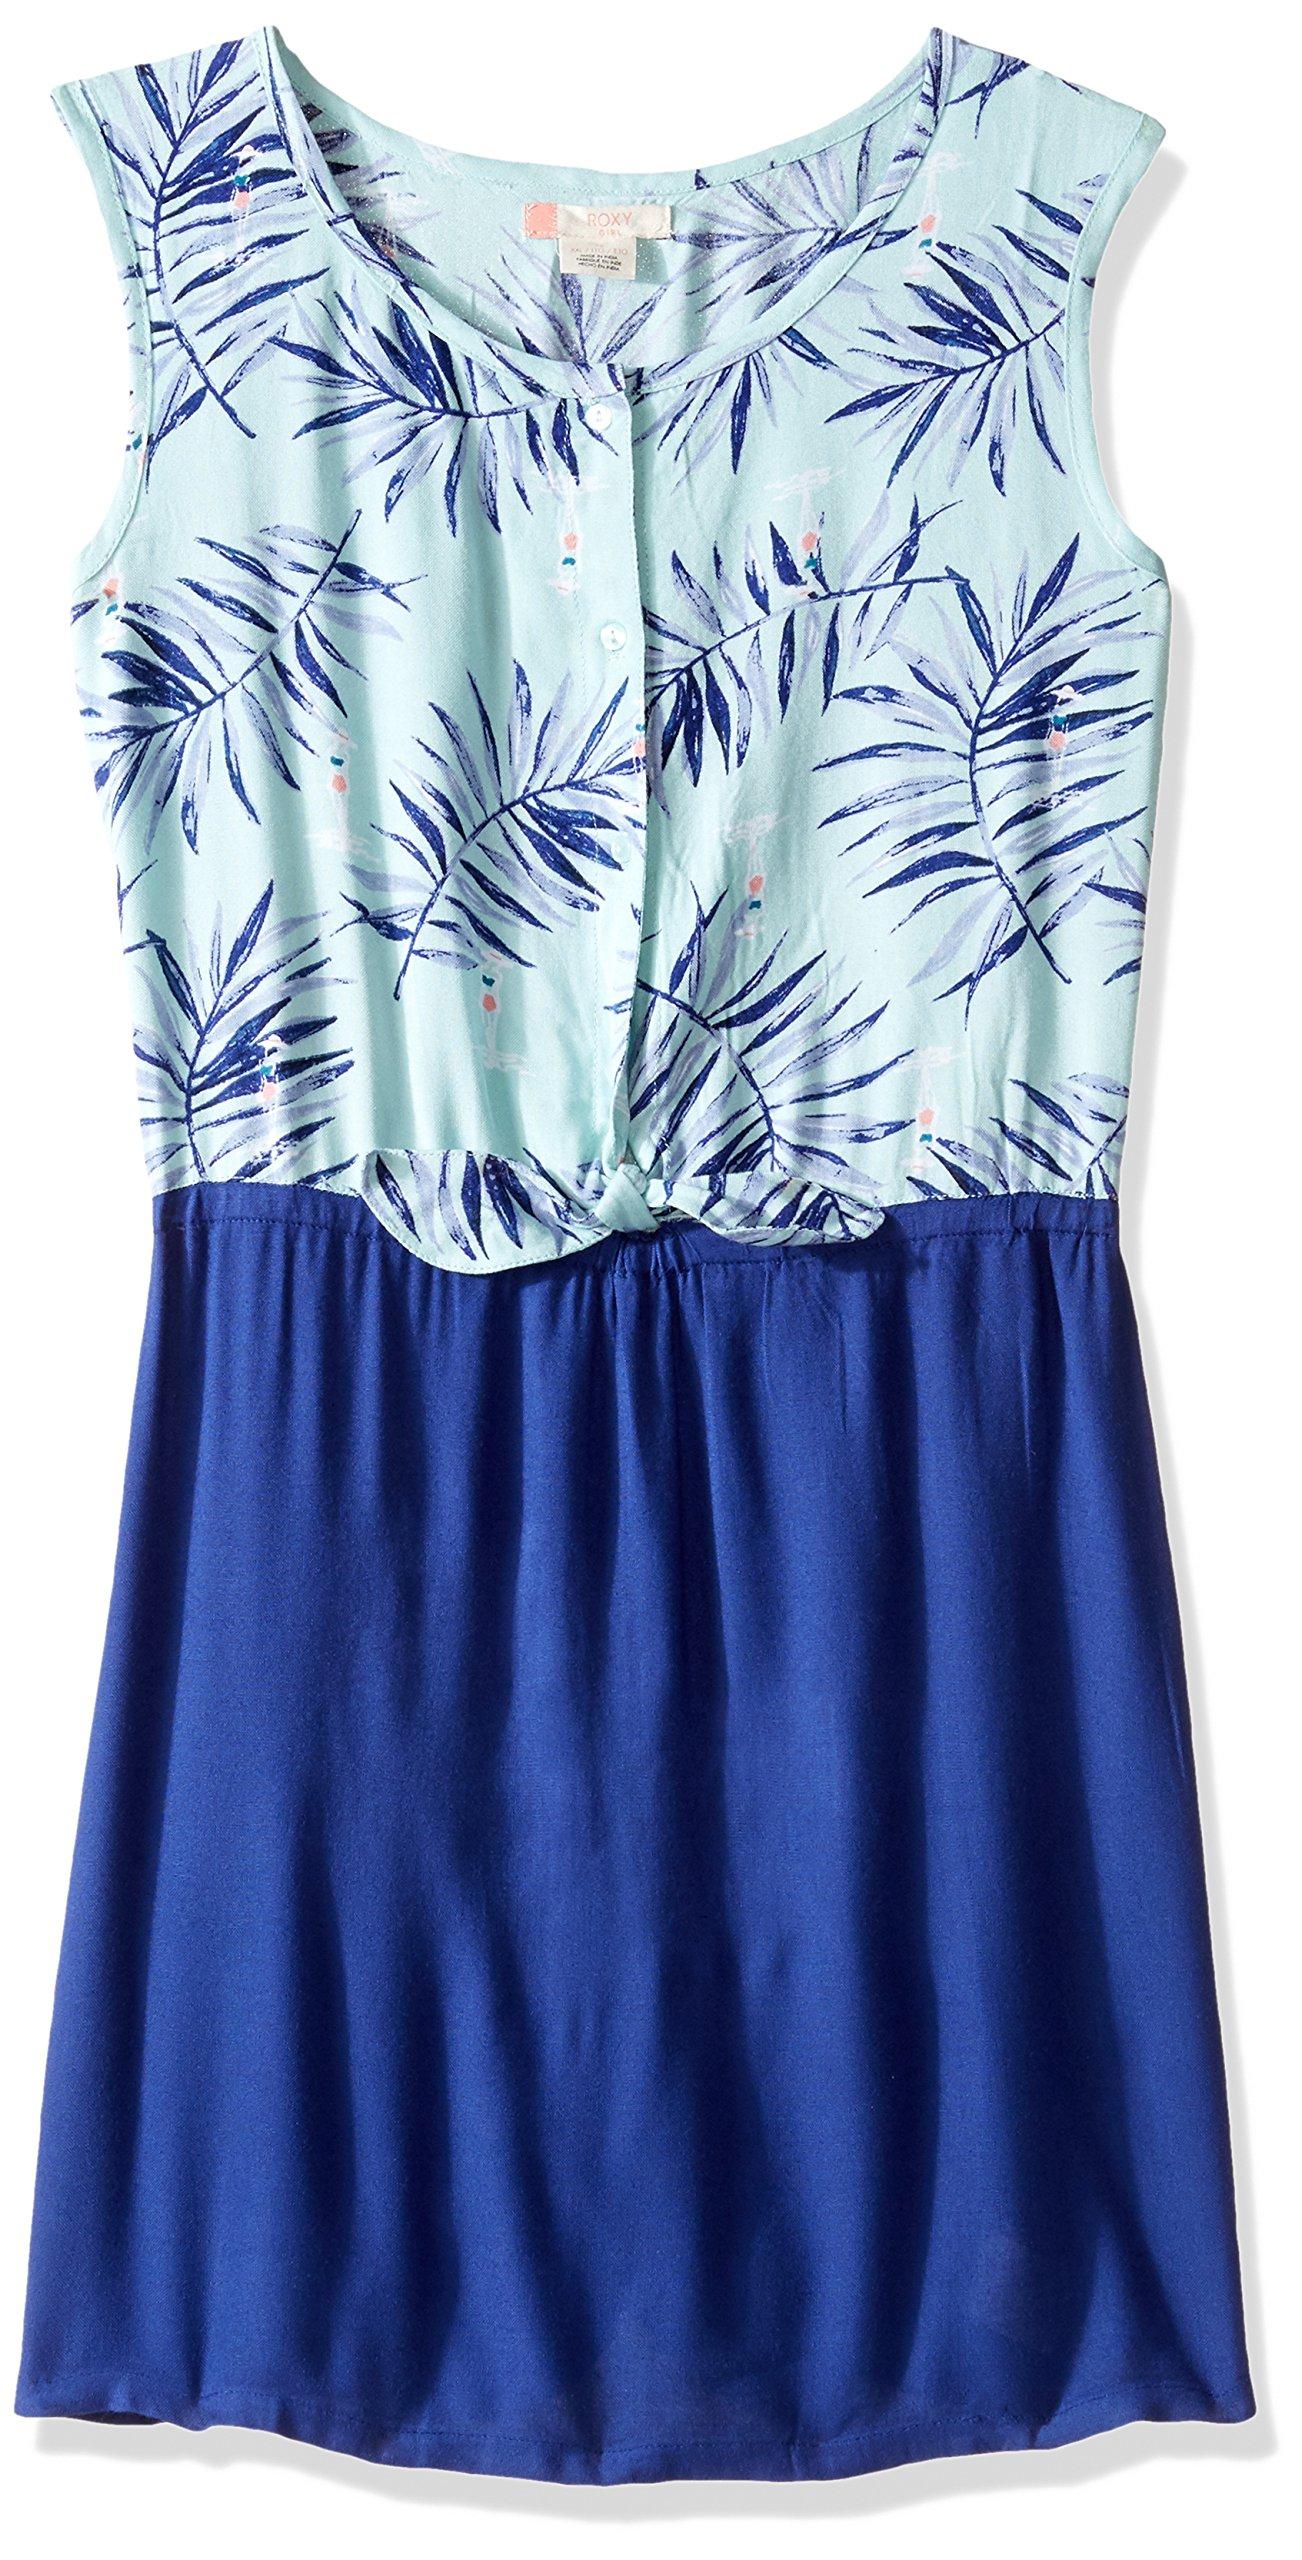 Roxy Big Girls' Maroccan Palace Dress, Beach Glass La Croisette, 8